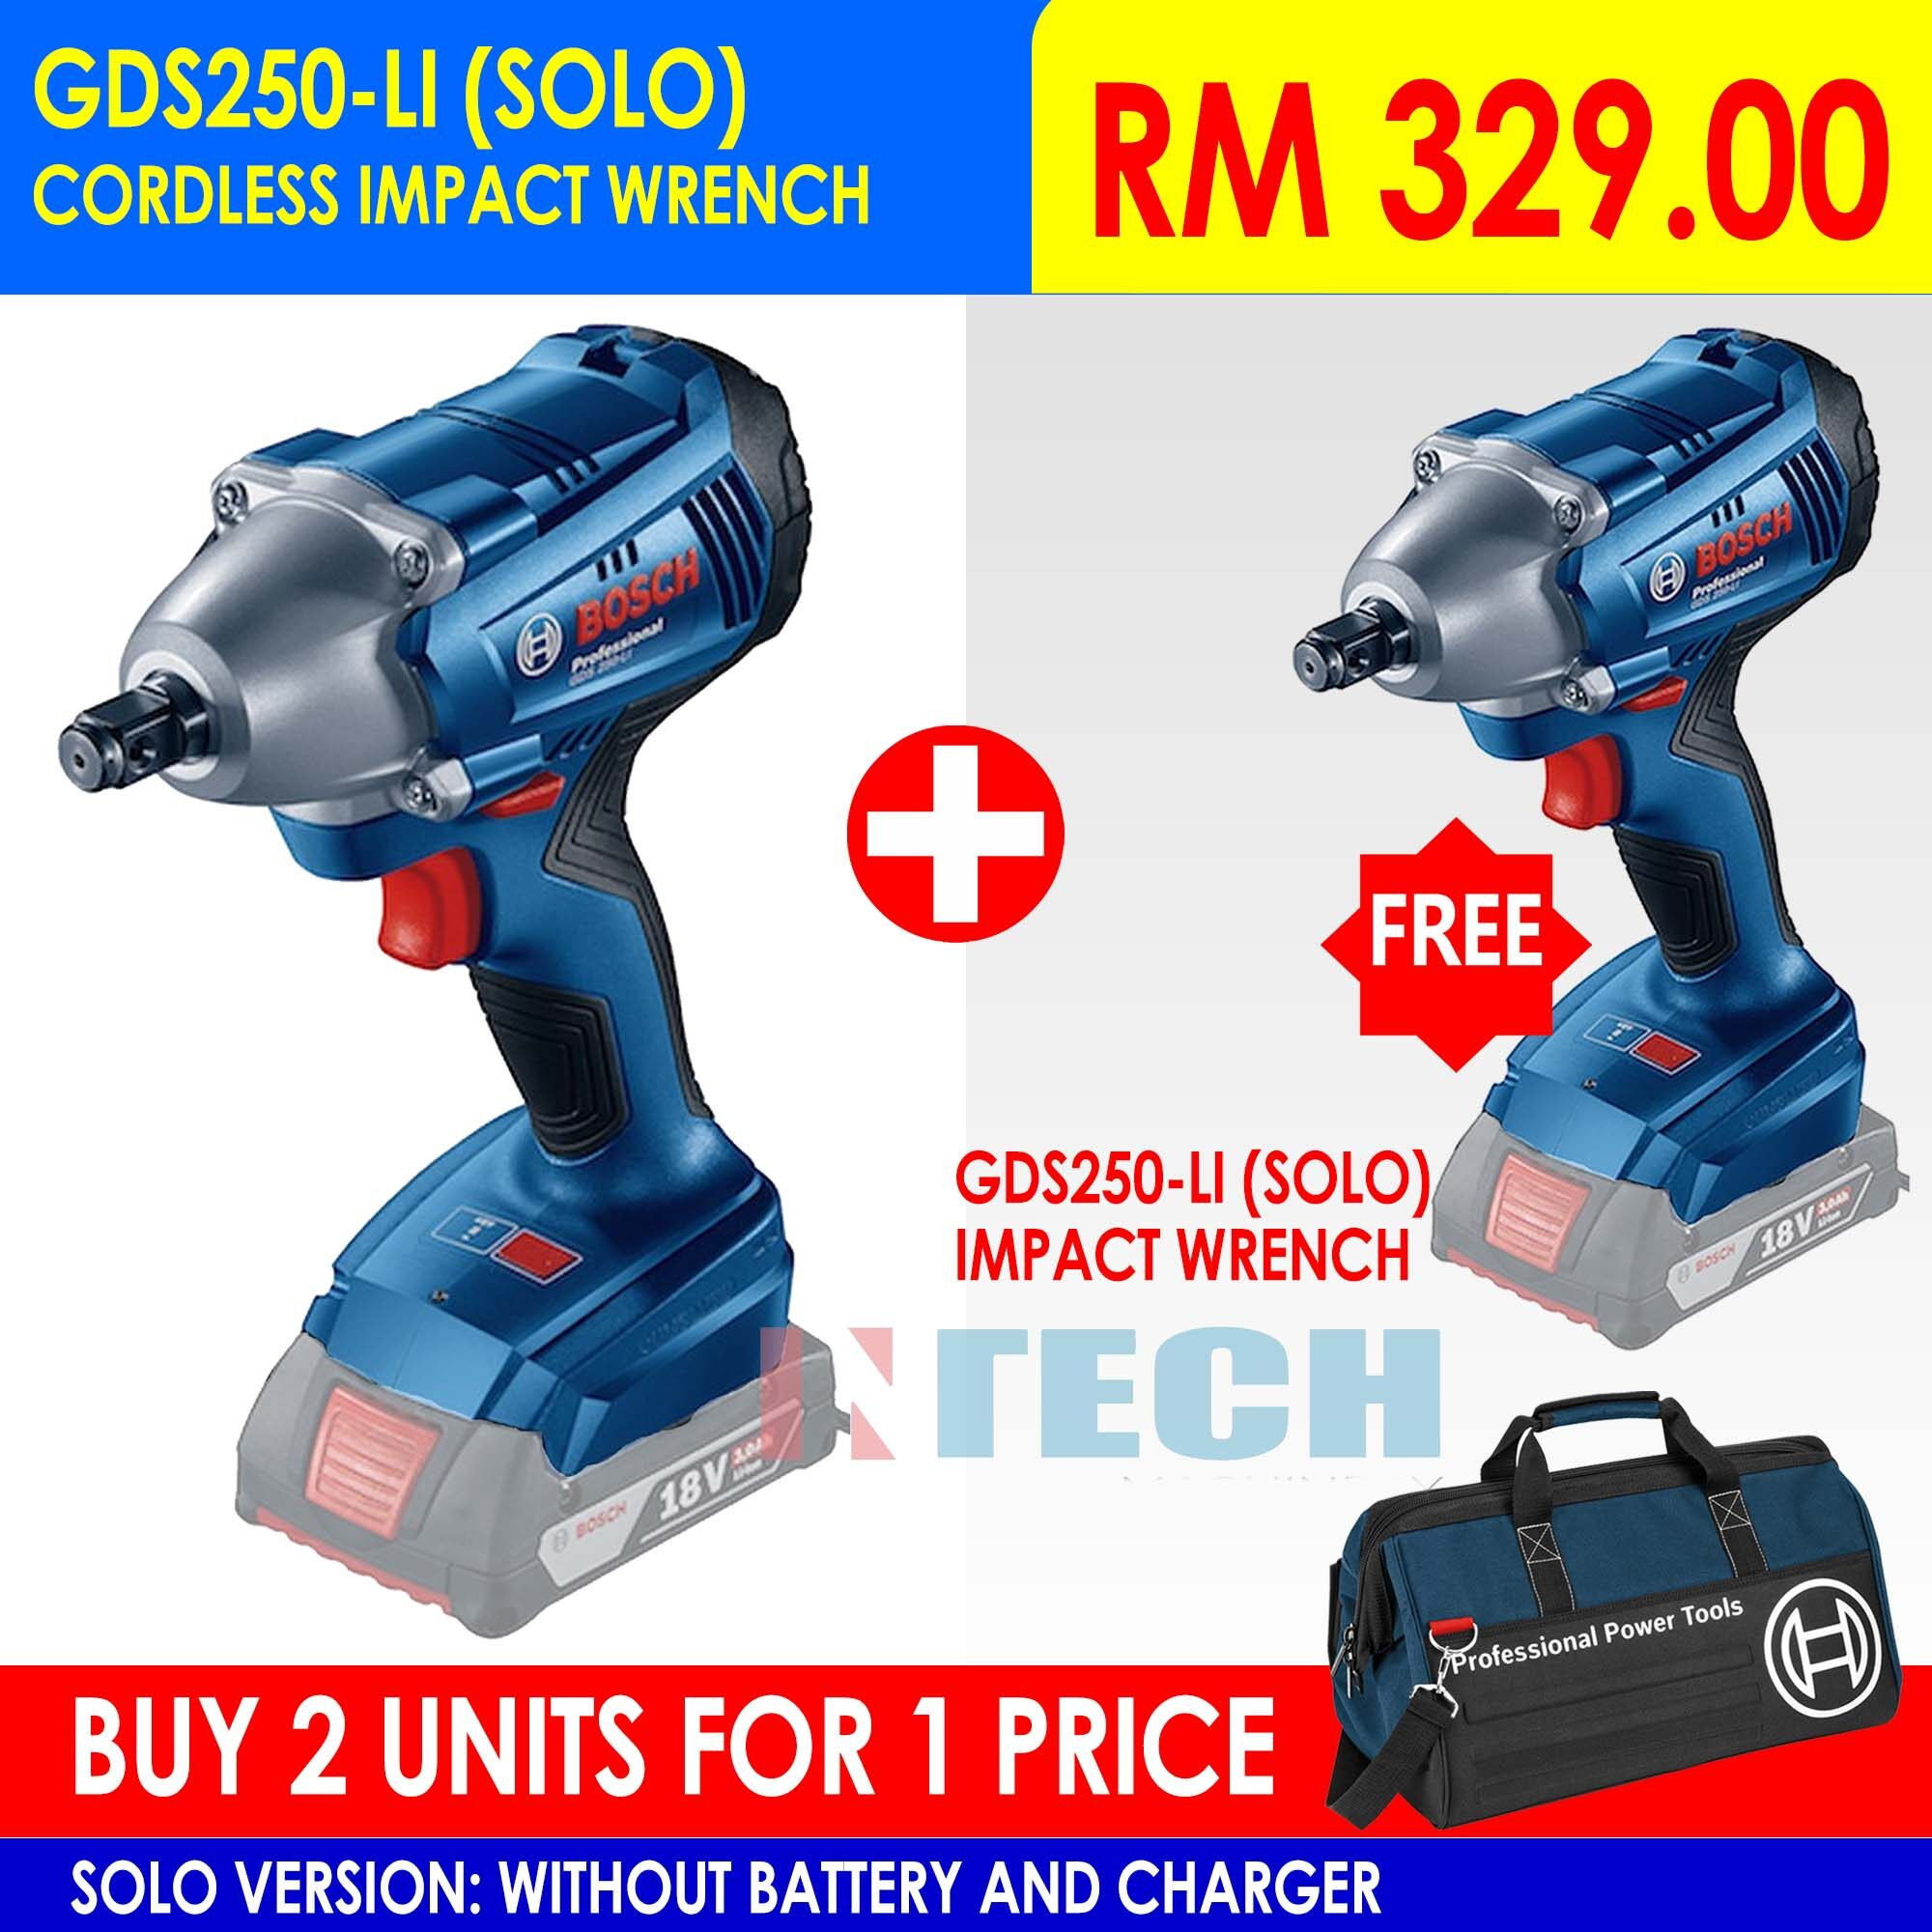 BOSCH GDS250-LI(SOLO) / GDS250LI(SOLO)CORDLESS IMPACT WRENCH C/W SOFT BAG (FREE 1 UNIT GDS250-LI SOLO)